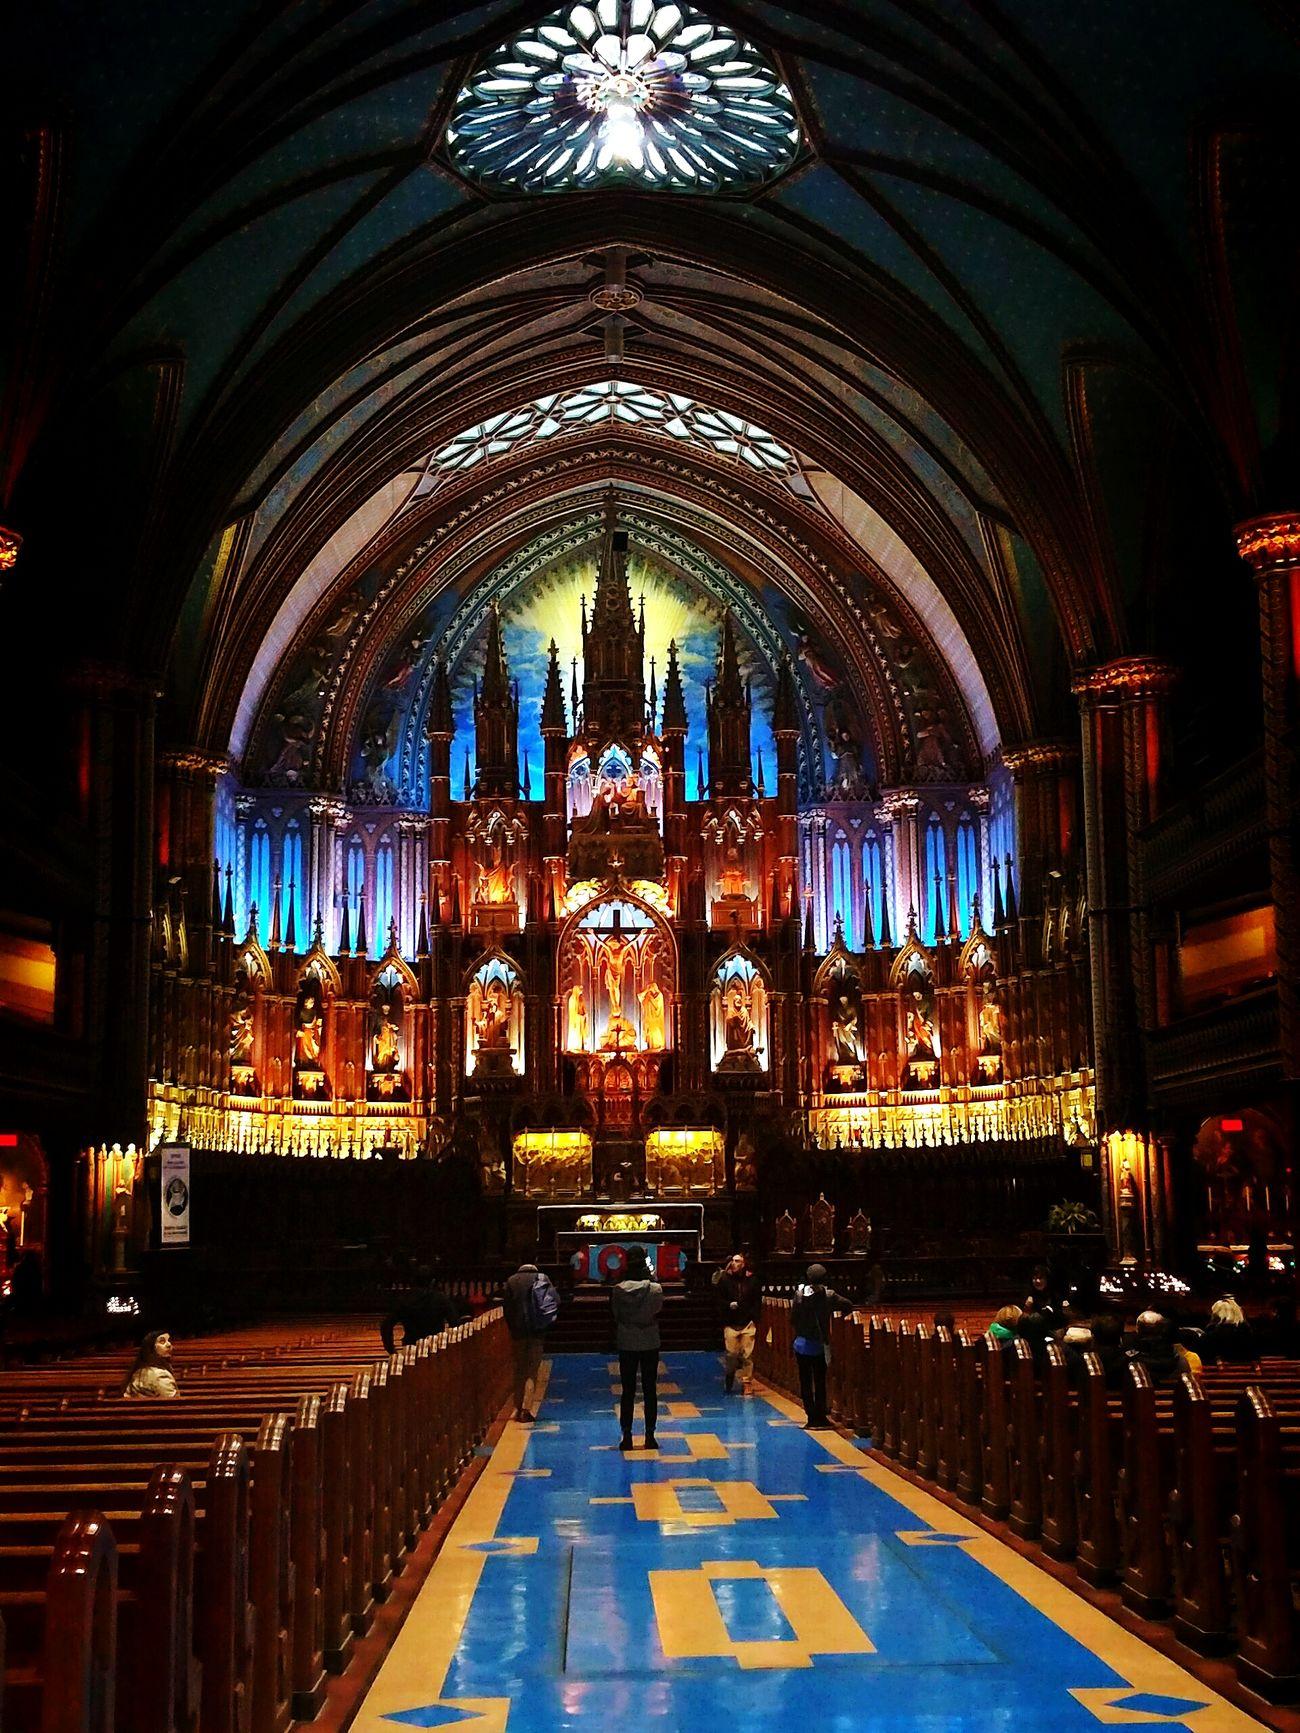 Taking Photos Montrealcity Montreal, Canada Notre-Dame Basilique Notre Dame Basilica Church Canada First Eyeem Photo